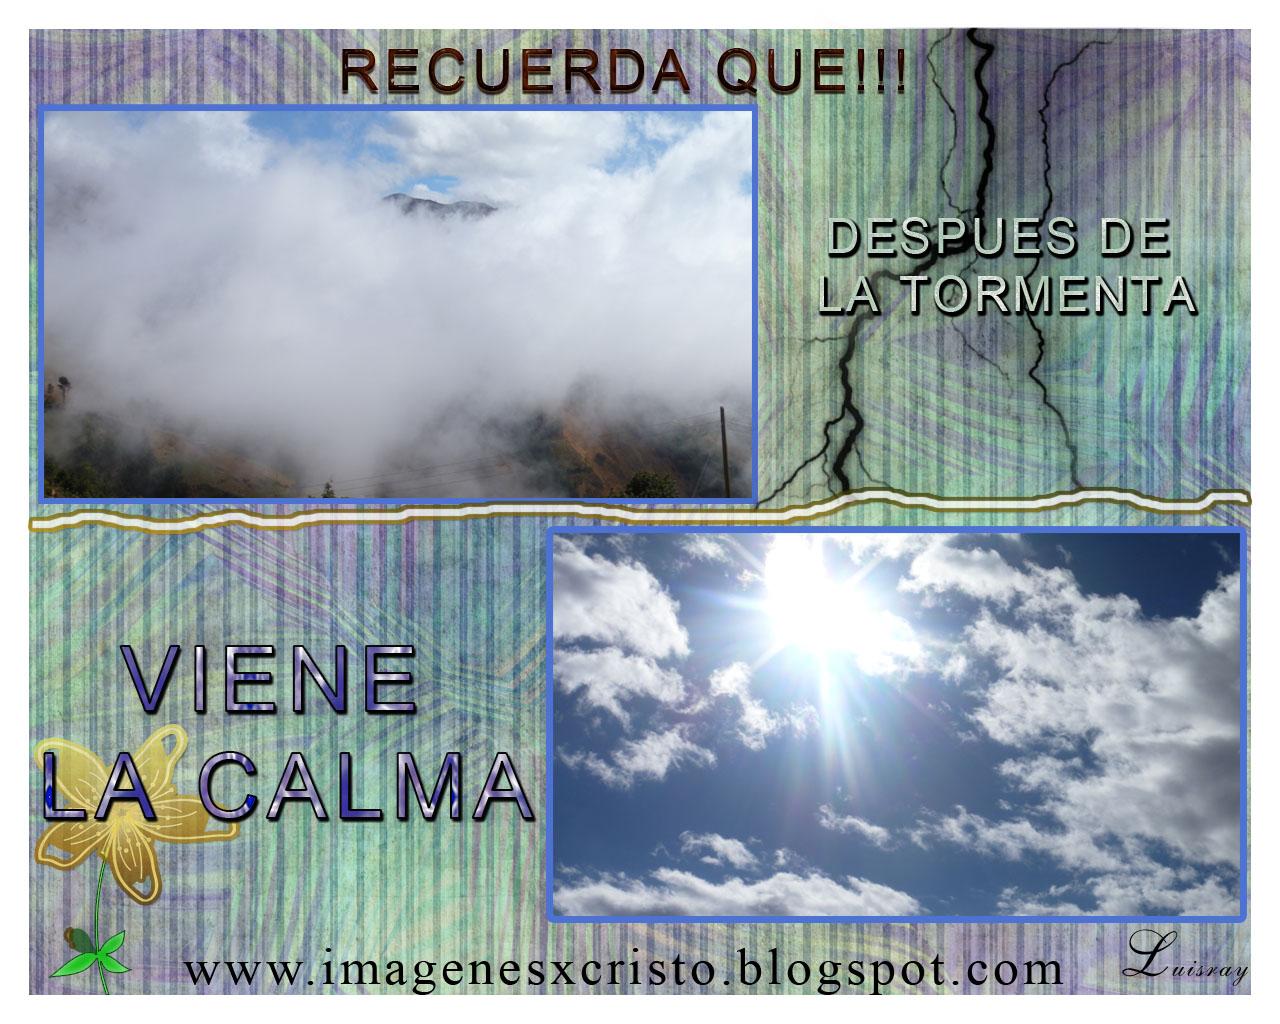 http://4.bp.blogspot.com/-D-Tc8gSb0rQ/T6lph3PRzkI/AAAAAAAAAO0/W34bANbD0ko/s1600/despues+de+la+tormenta+viene+la+calma.jpg